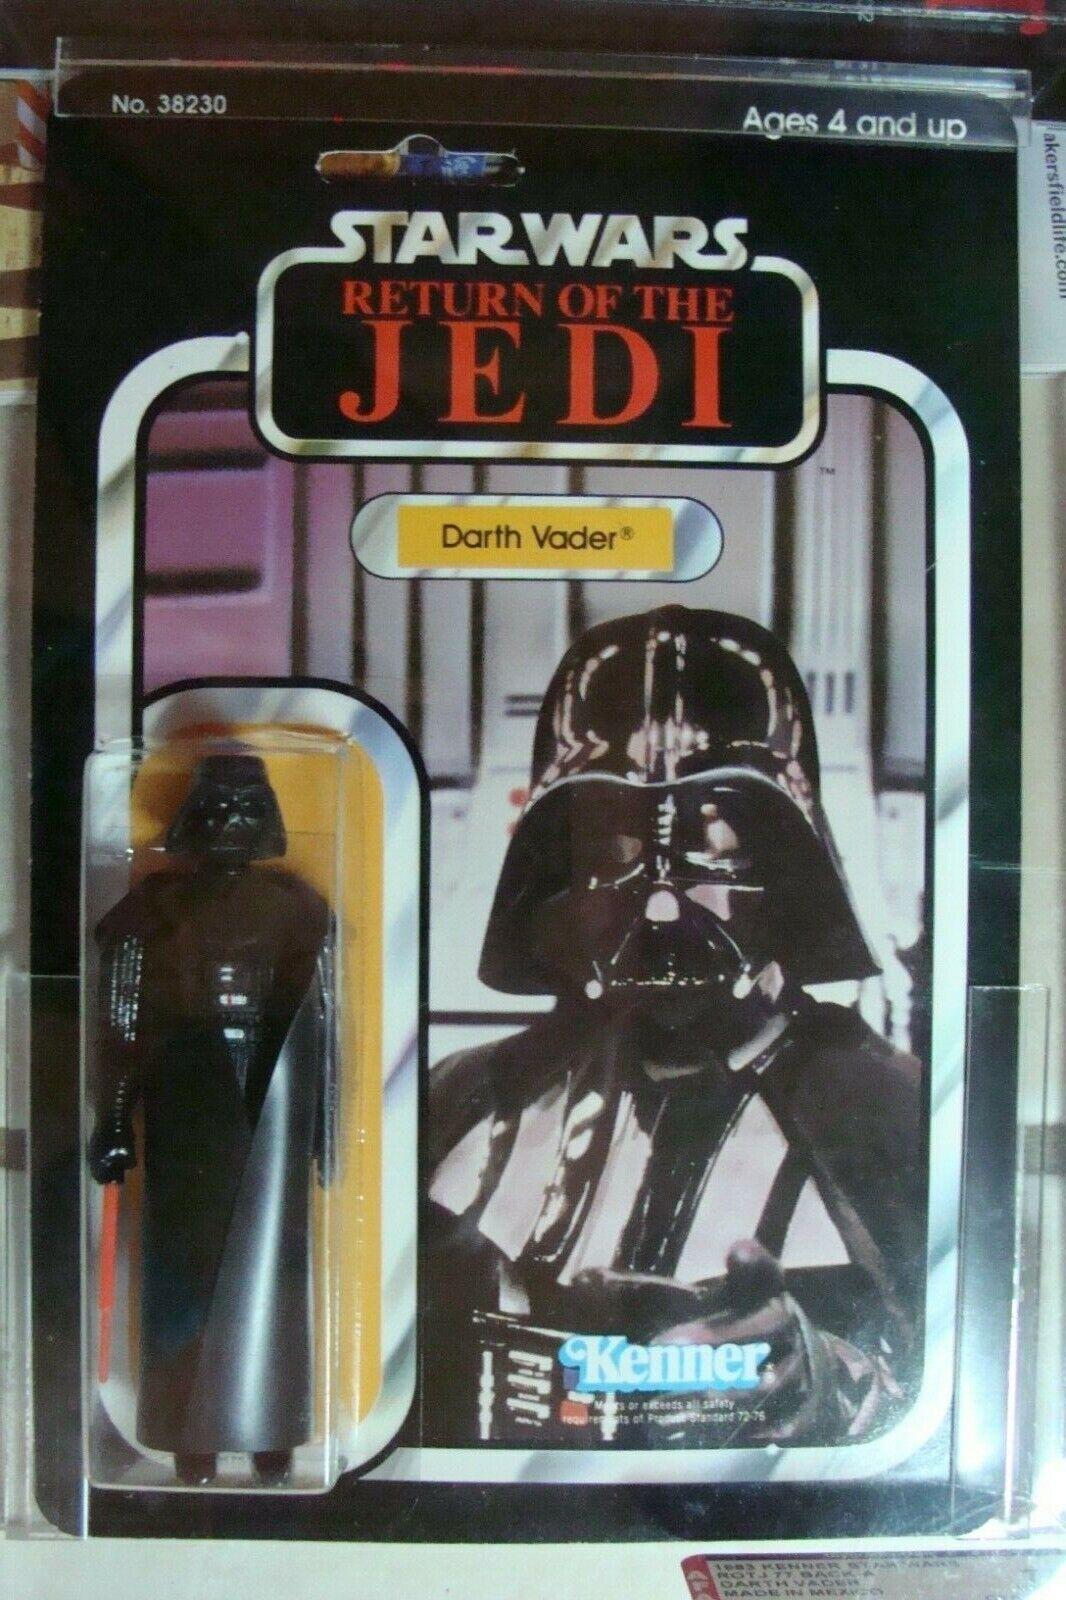 Star Wars Afa  75 Darth Vader Fabriqué en Mexico Action Figurine 1983 Kenner  forme unique